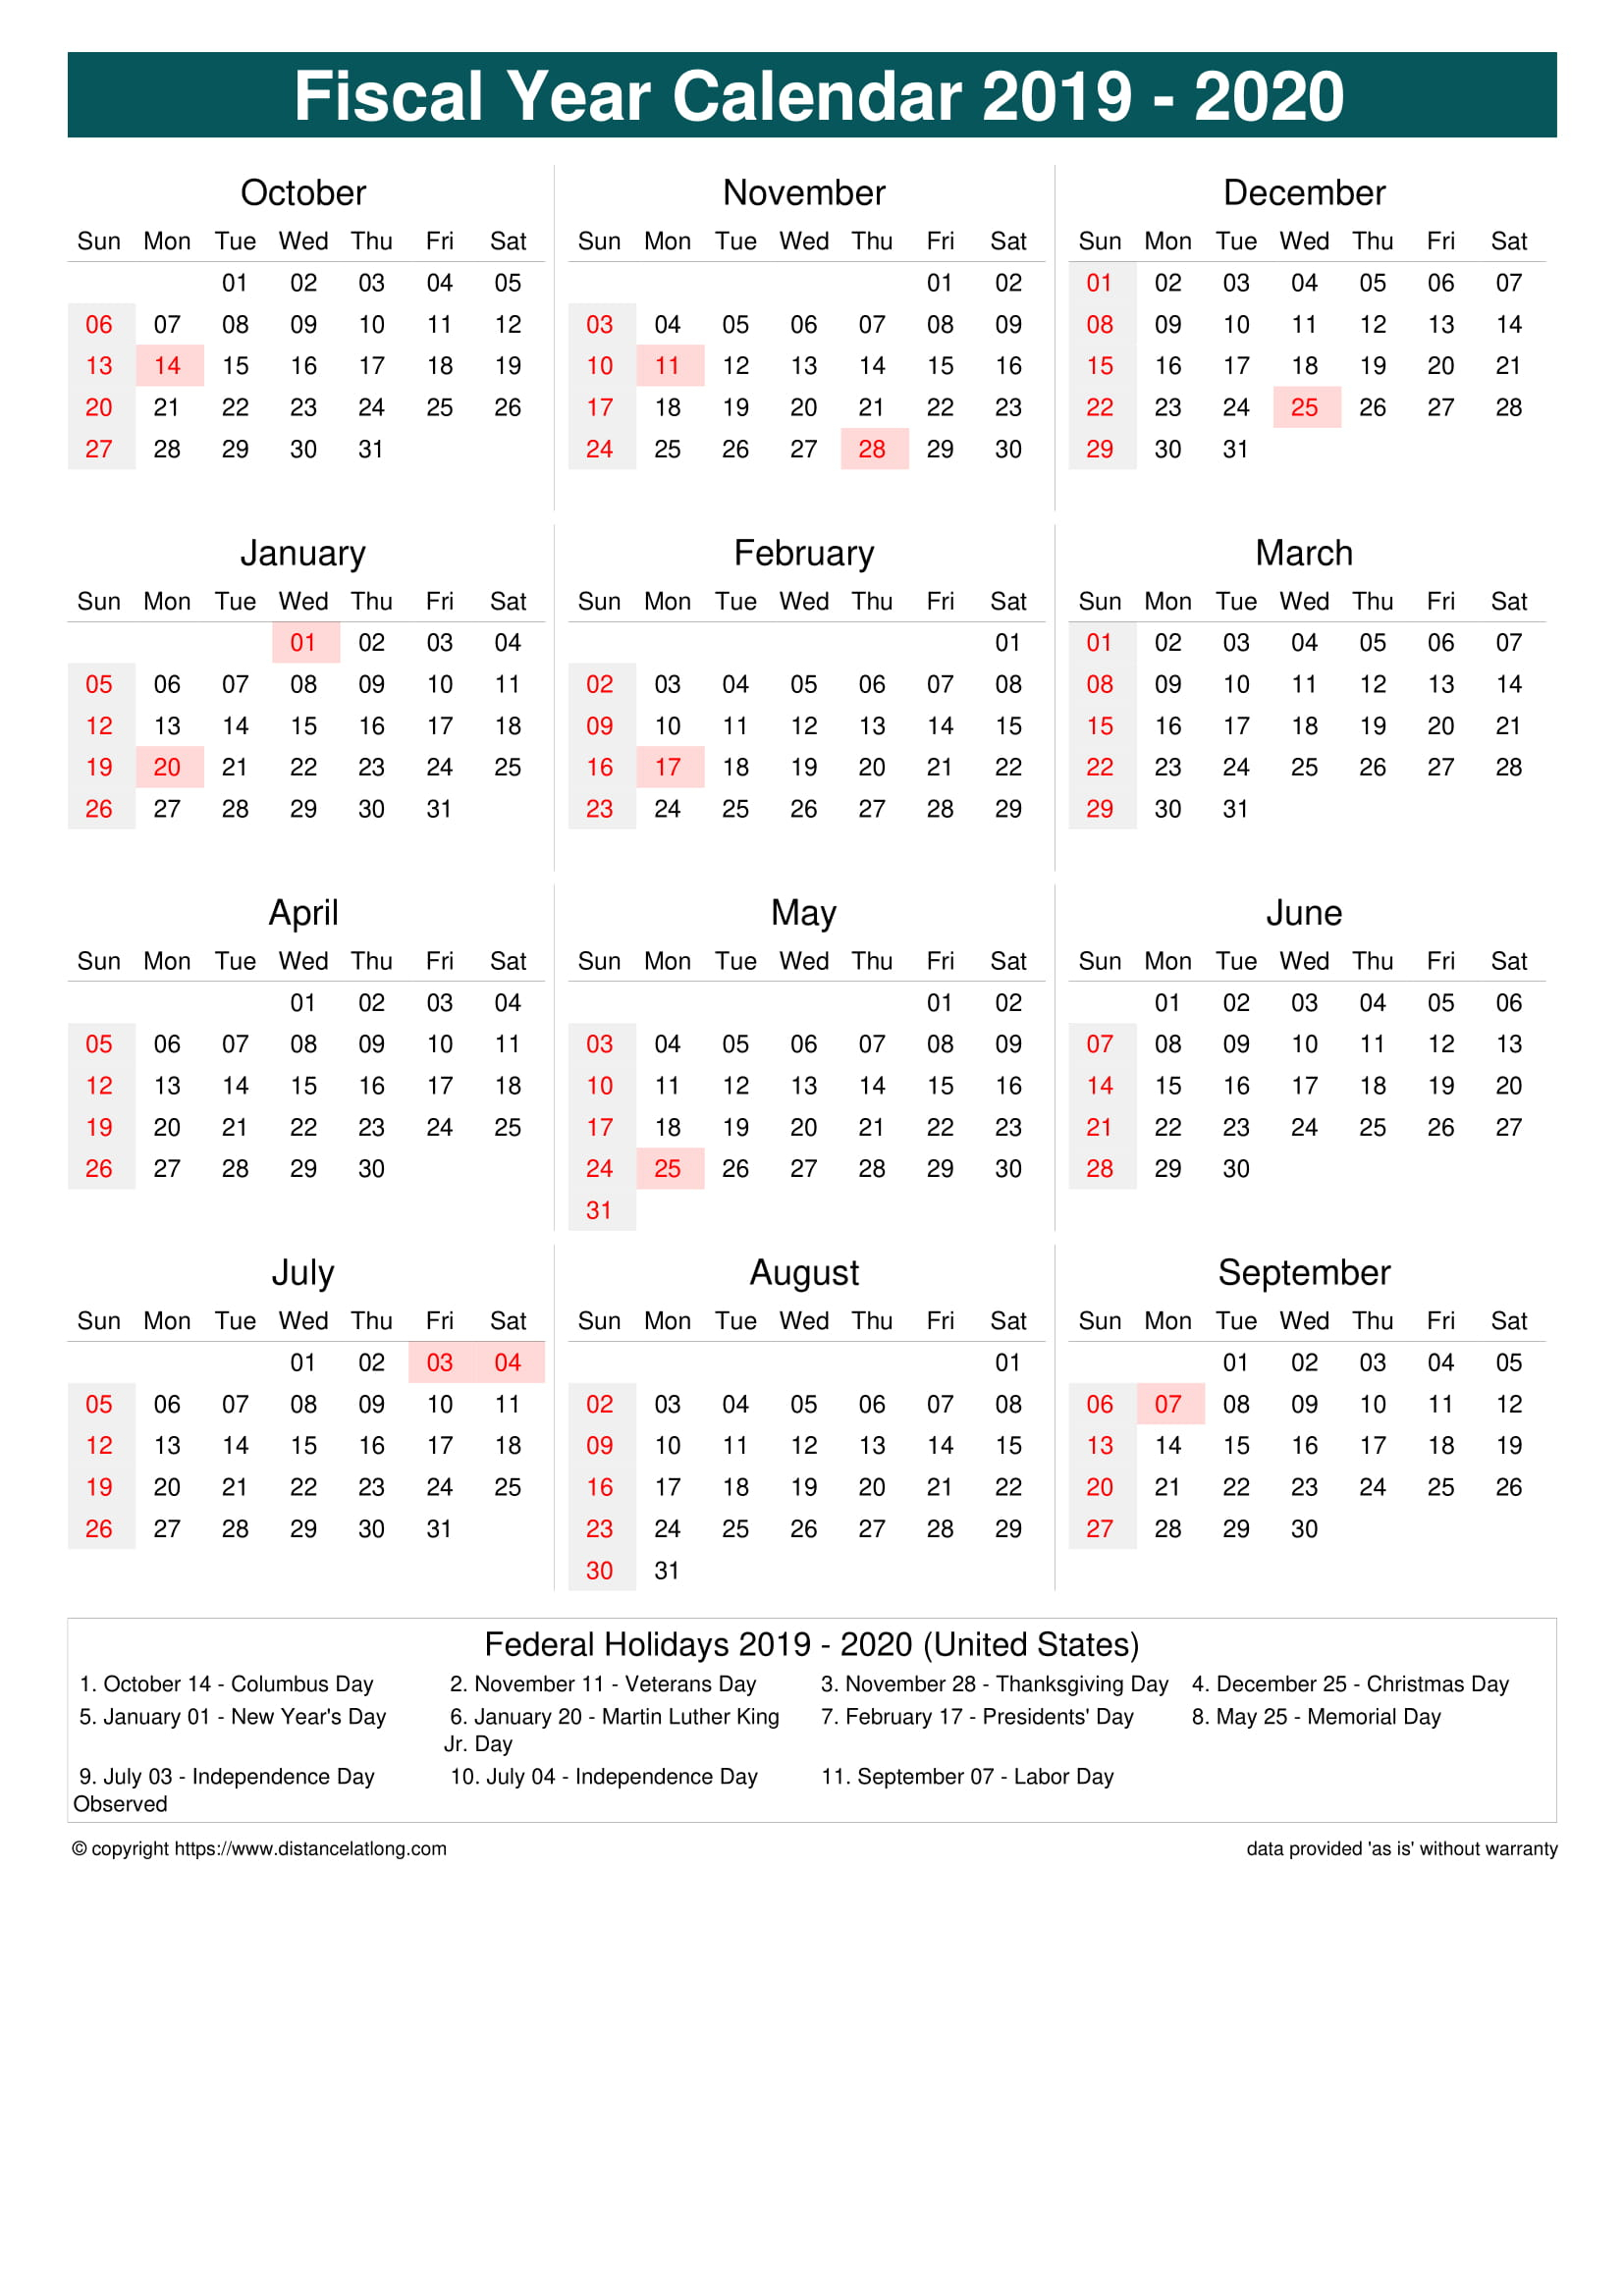 Fiscal Year 2019-2020 Calendar Templates, Free Printable throughout Fiscal Calendar For October 2020